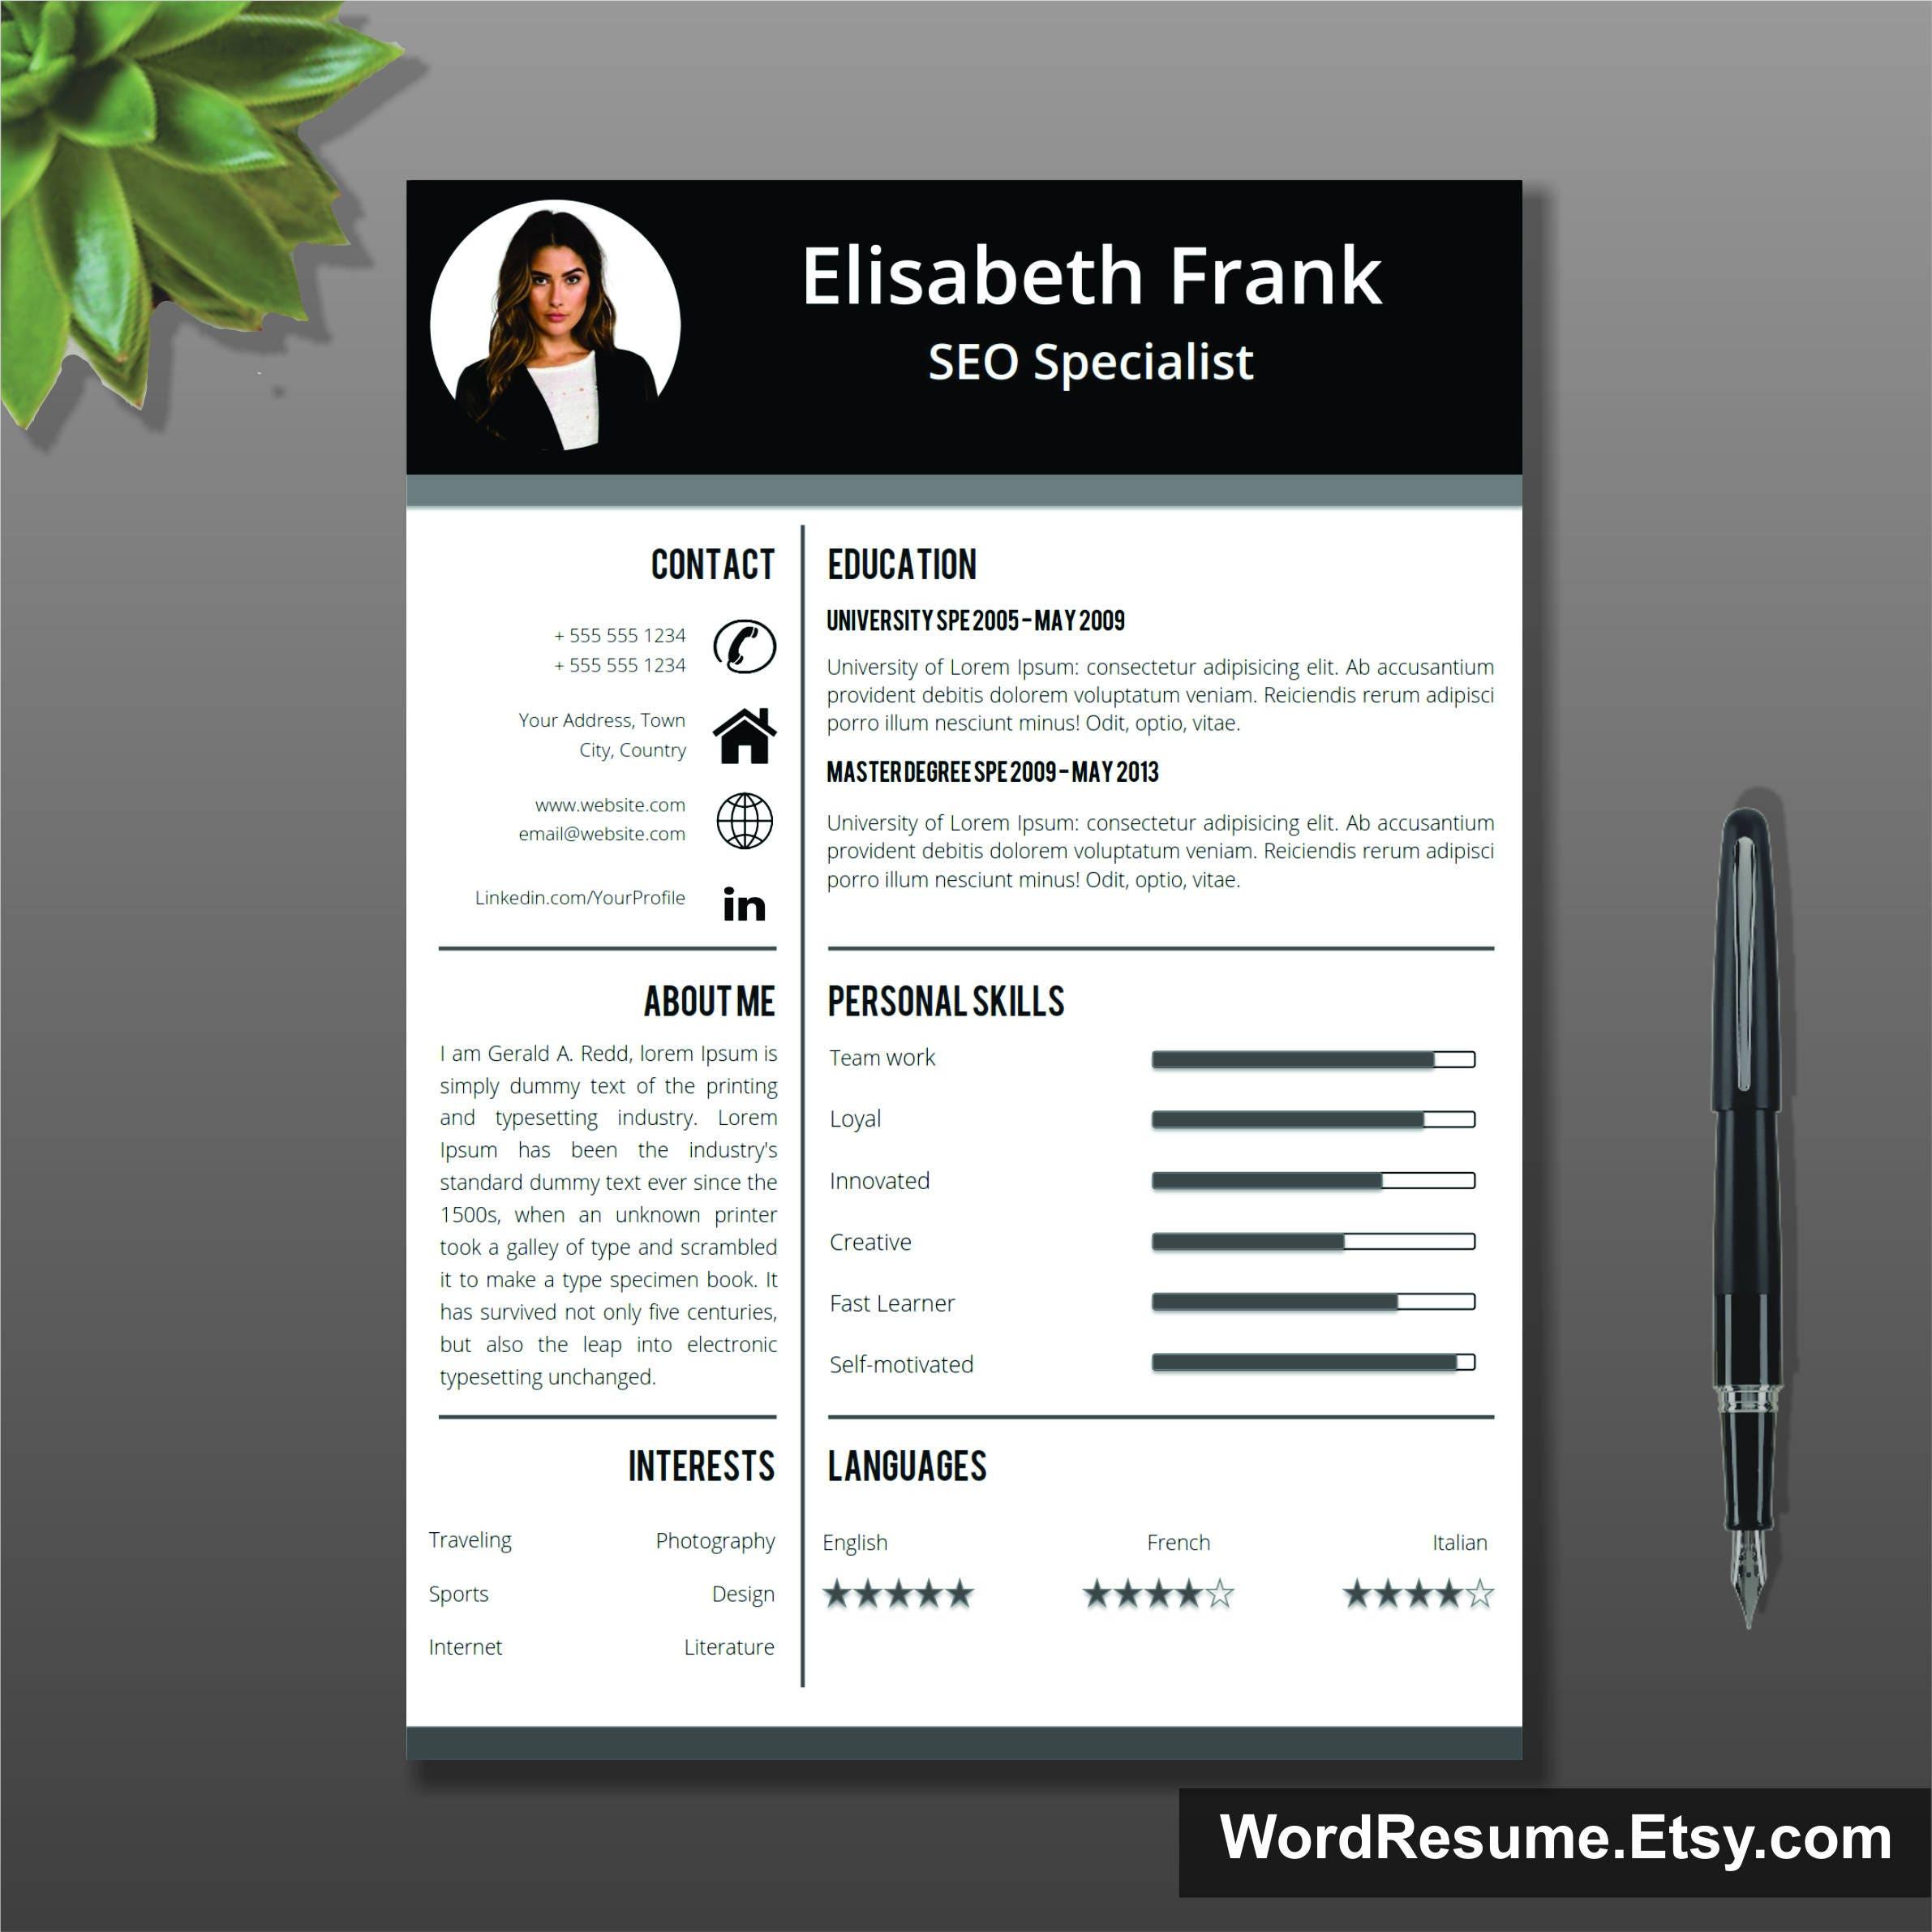 Creative Resume Template, Cover Letter Word, Curriculum Vitae, Professional  Resume Template Design, Lebenslauf, Teacher Resume Template, CV